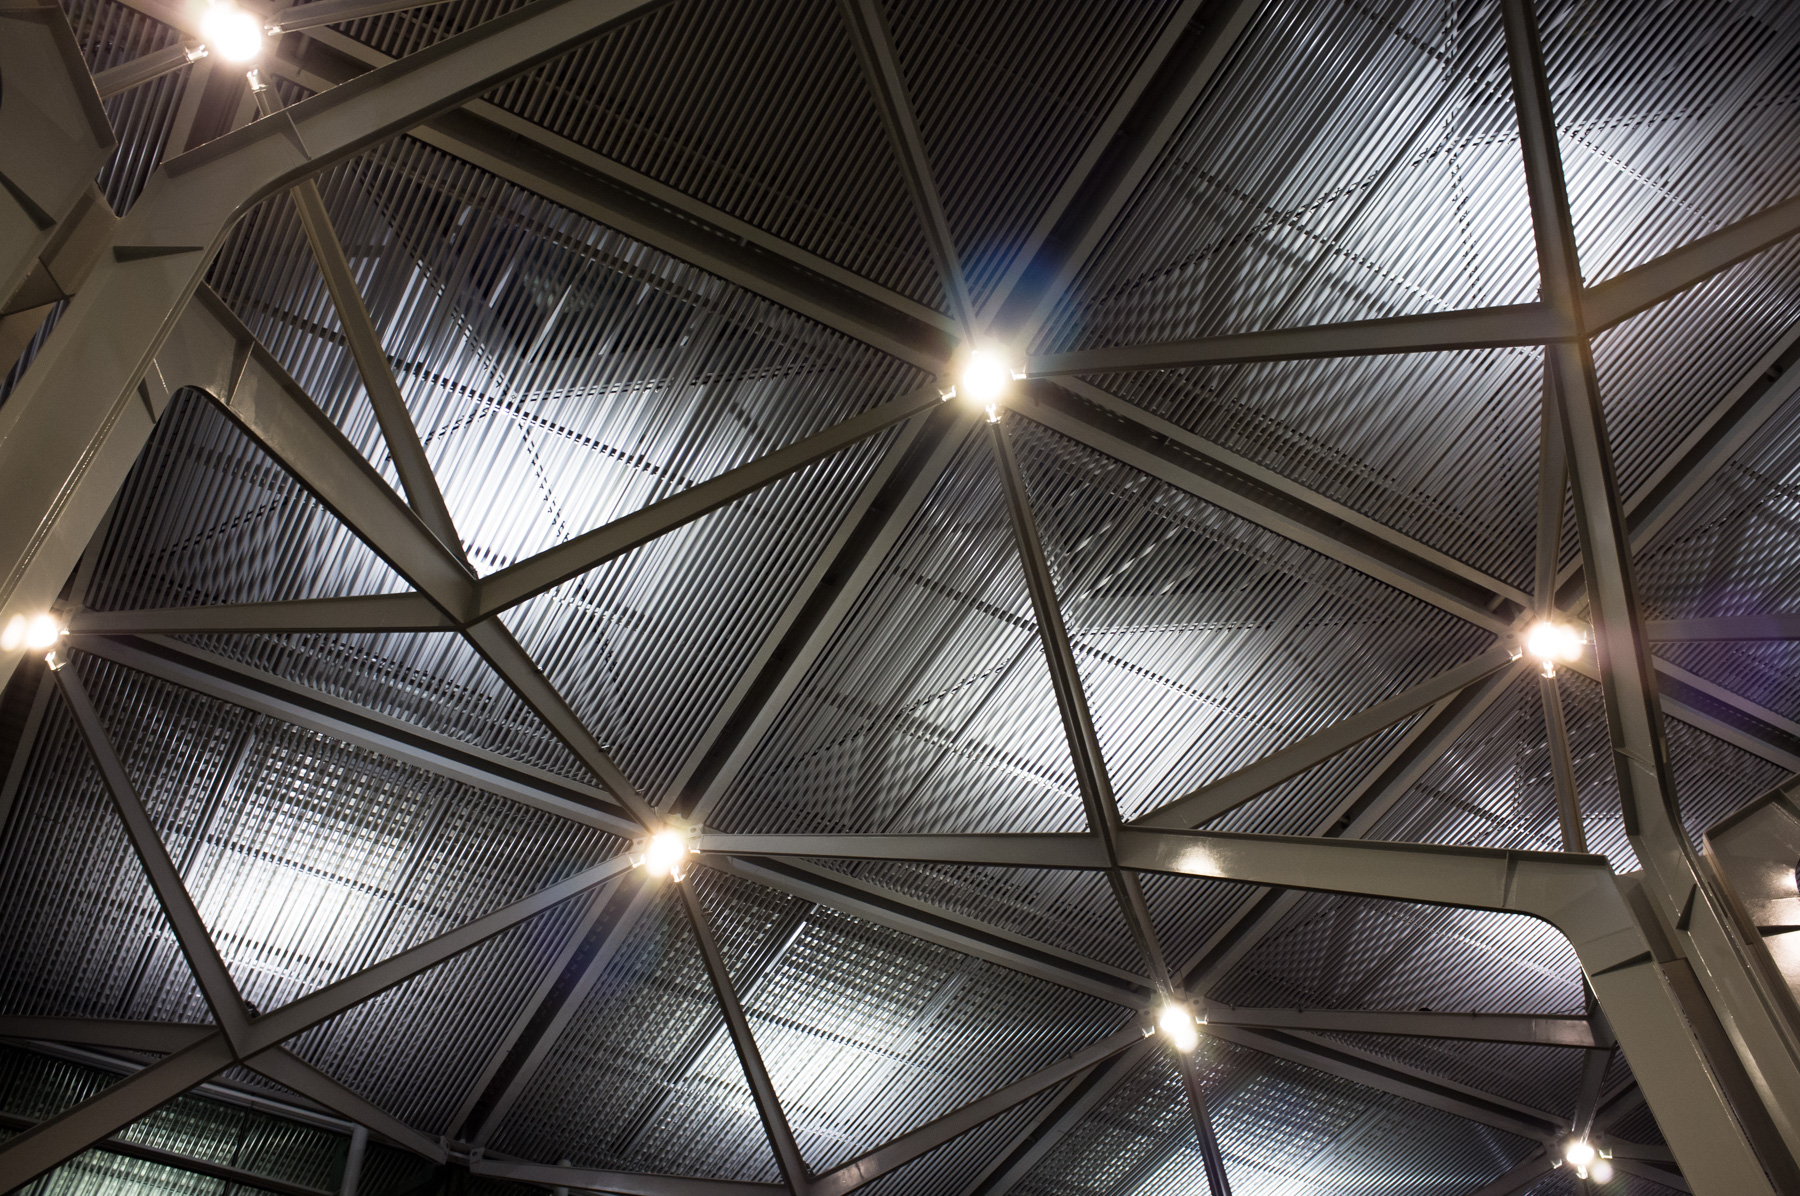 Abstr_Ceiling